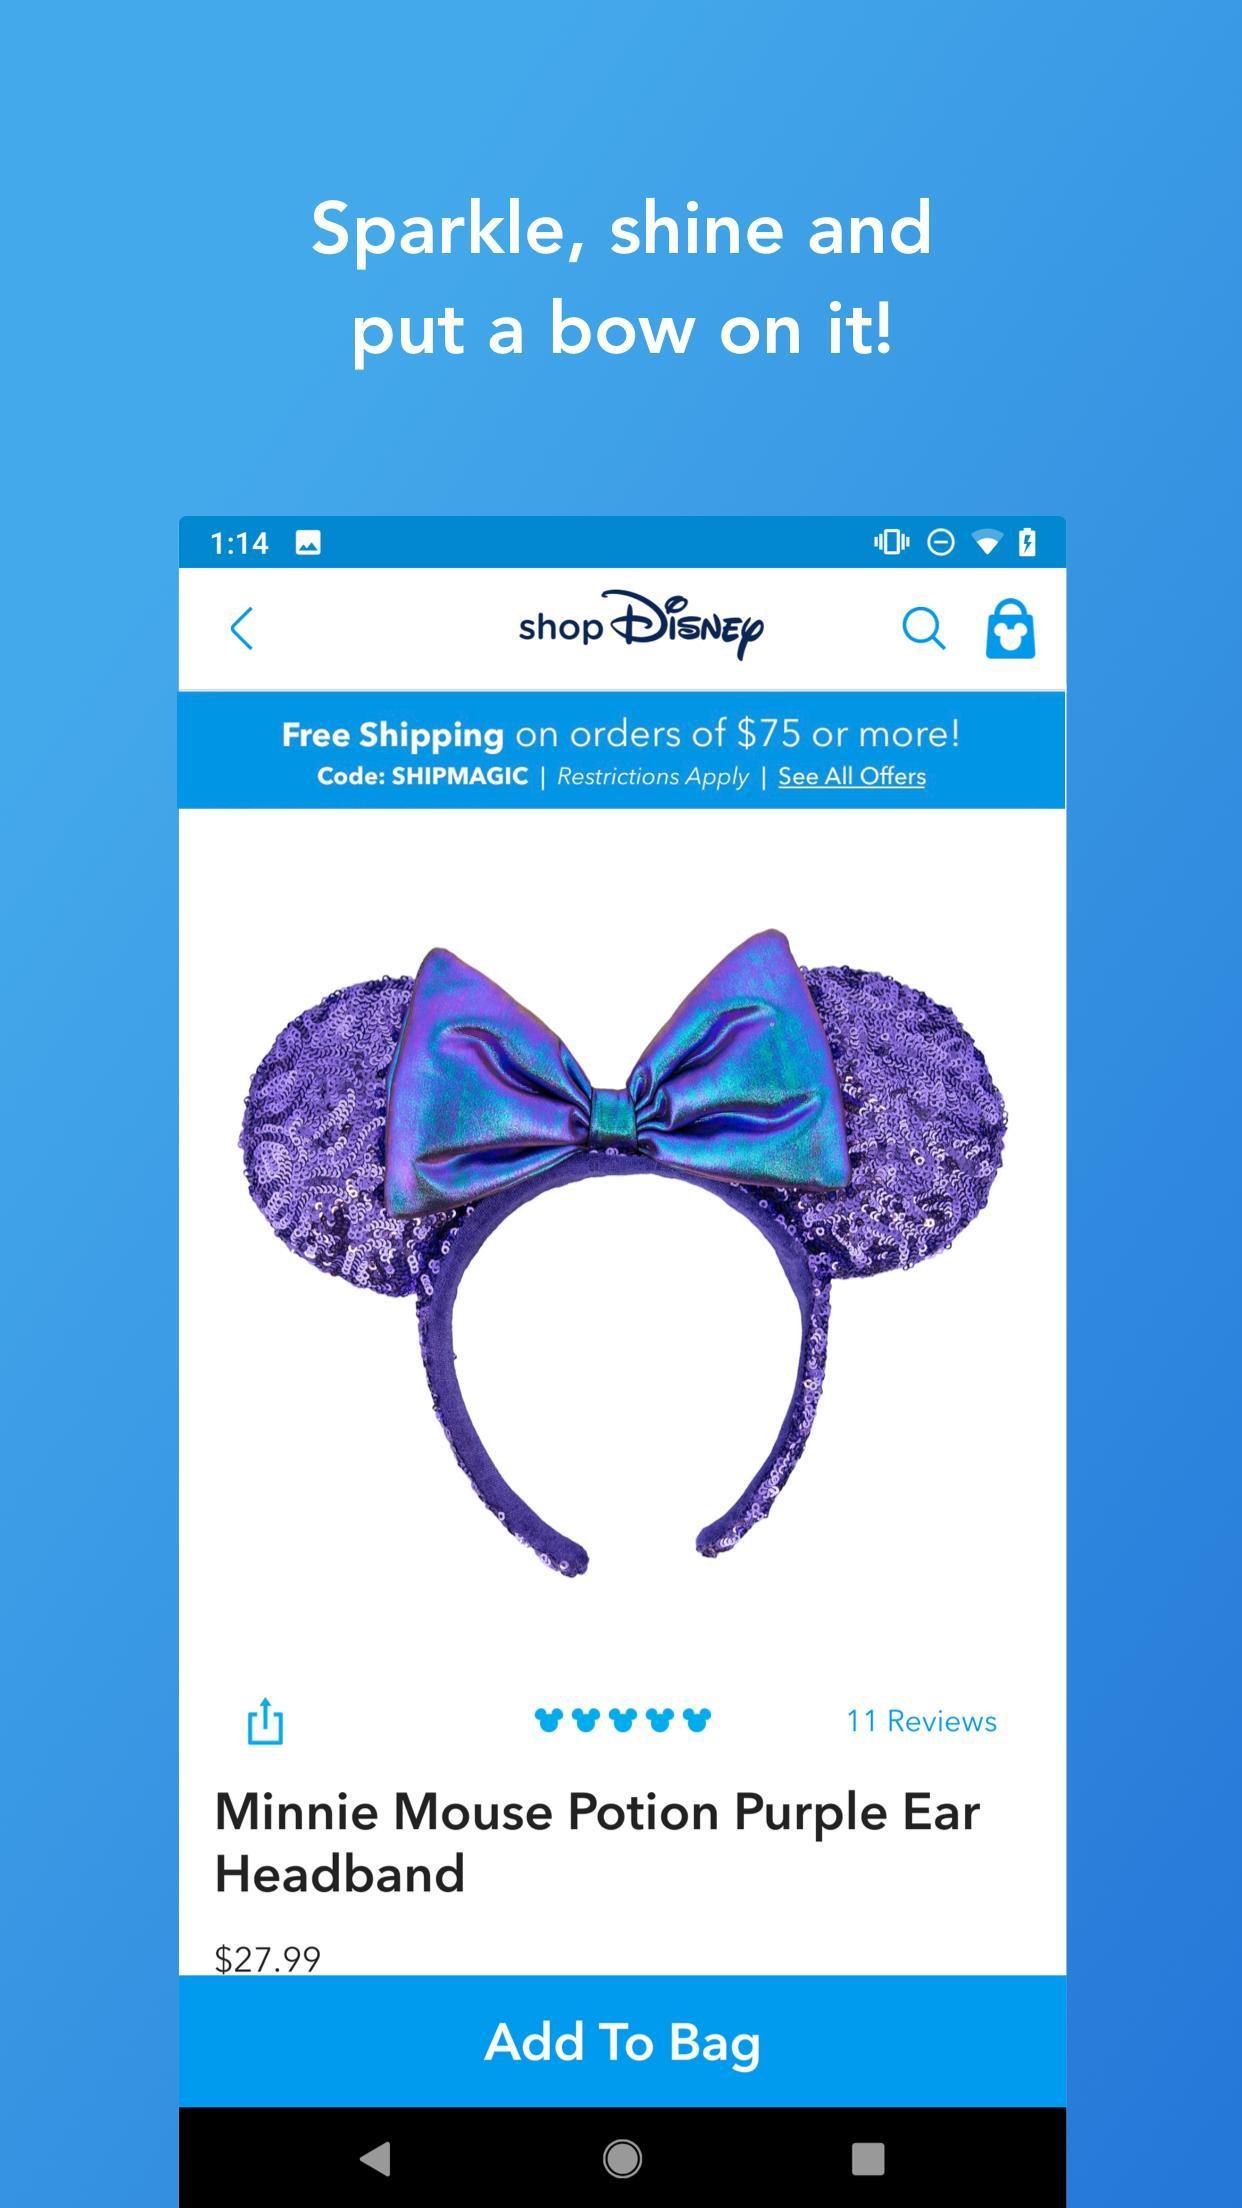 Shop Disney 3.1.1 Screenshot 4